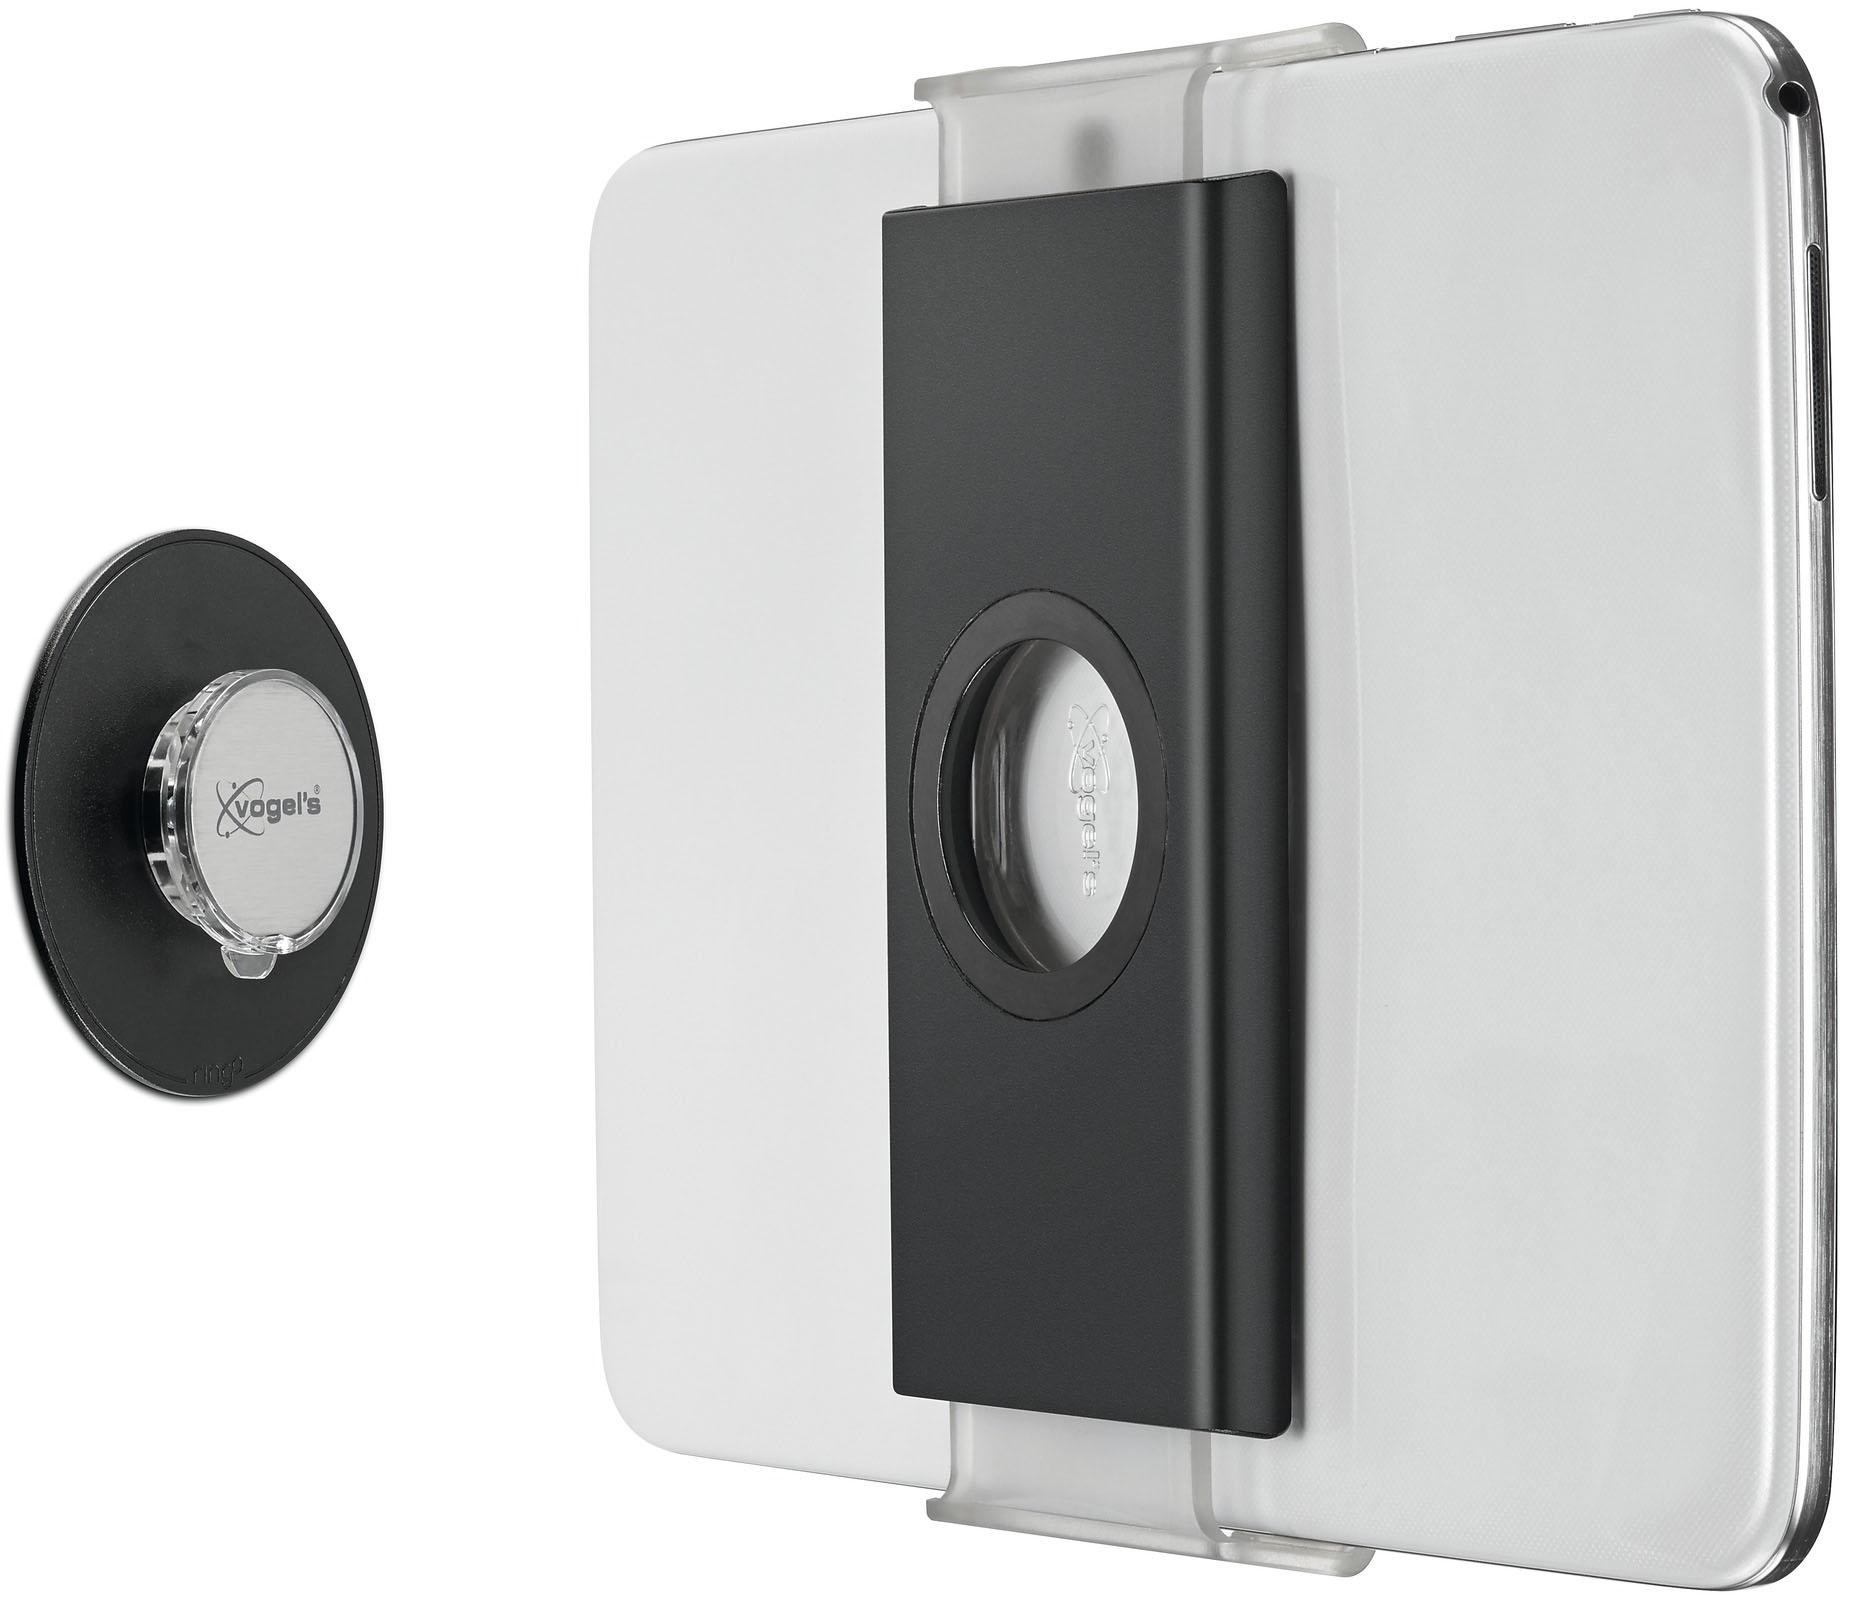 Vogel's TMS 1010 - комплект для настенного монтажа планшетов